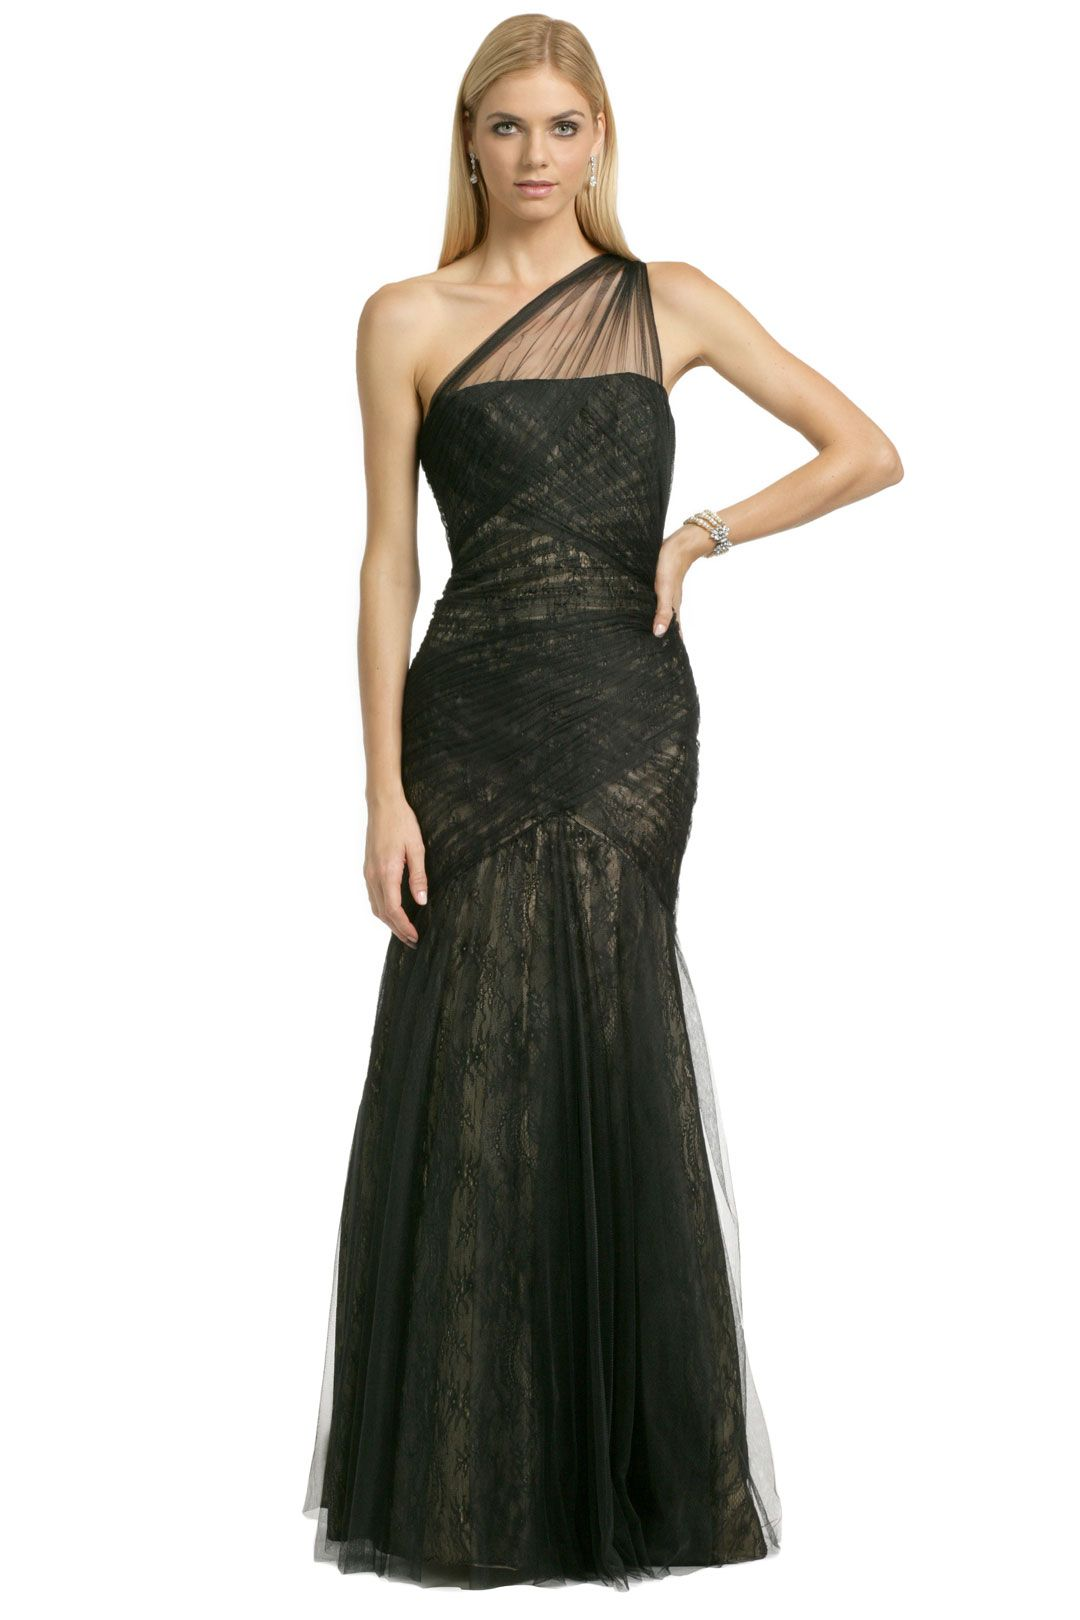 Pin by mette johansen on my style pinterest black wedding